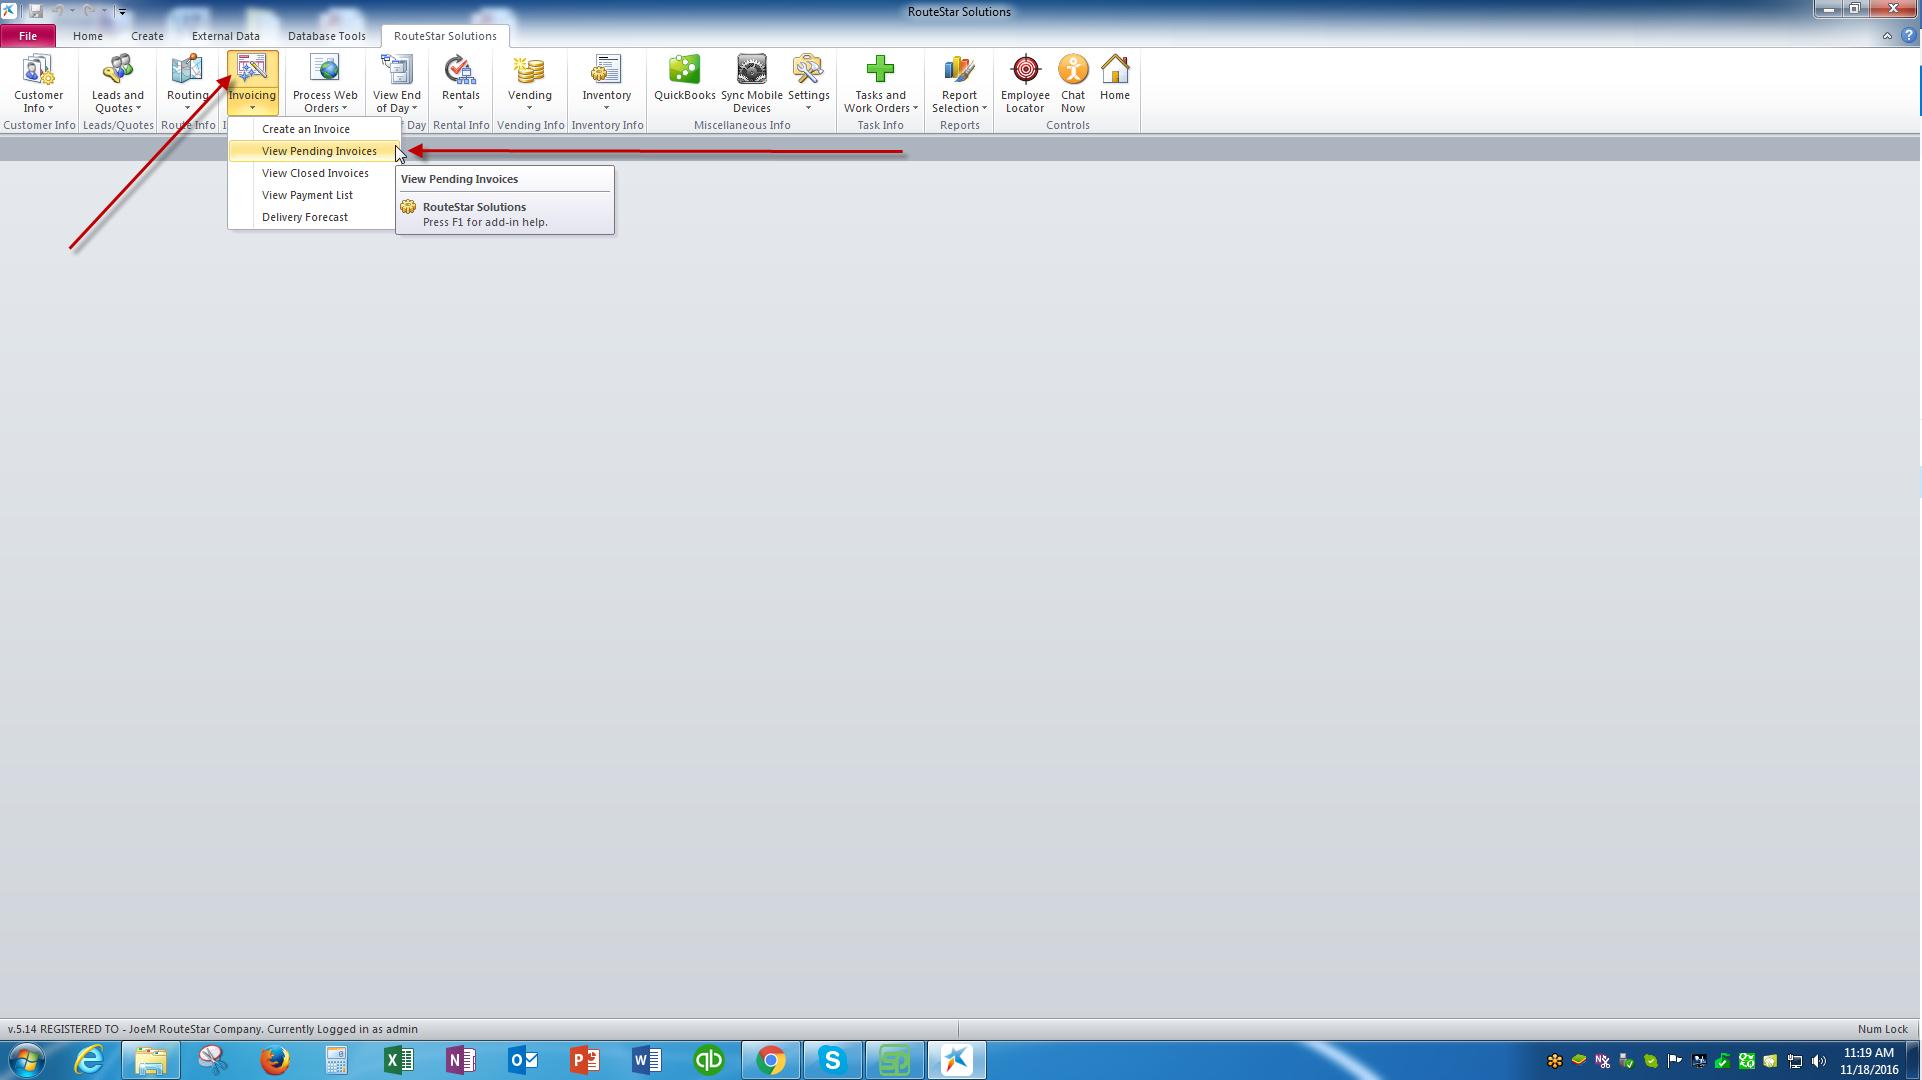 Open Invoice Report Online Help Center - Open invoice report